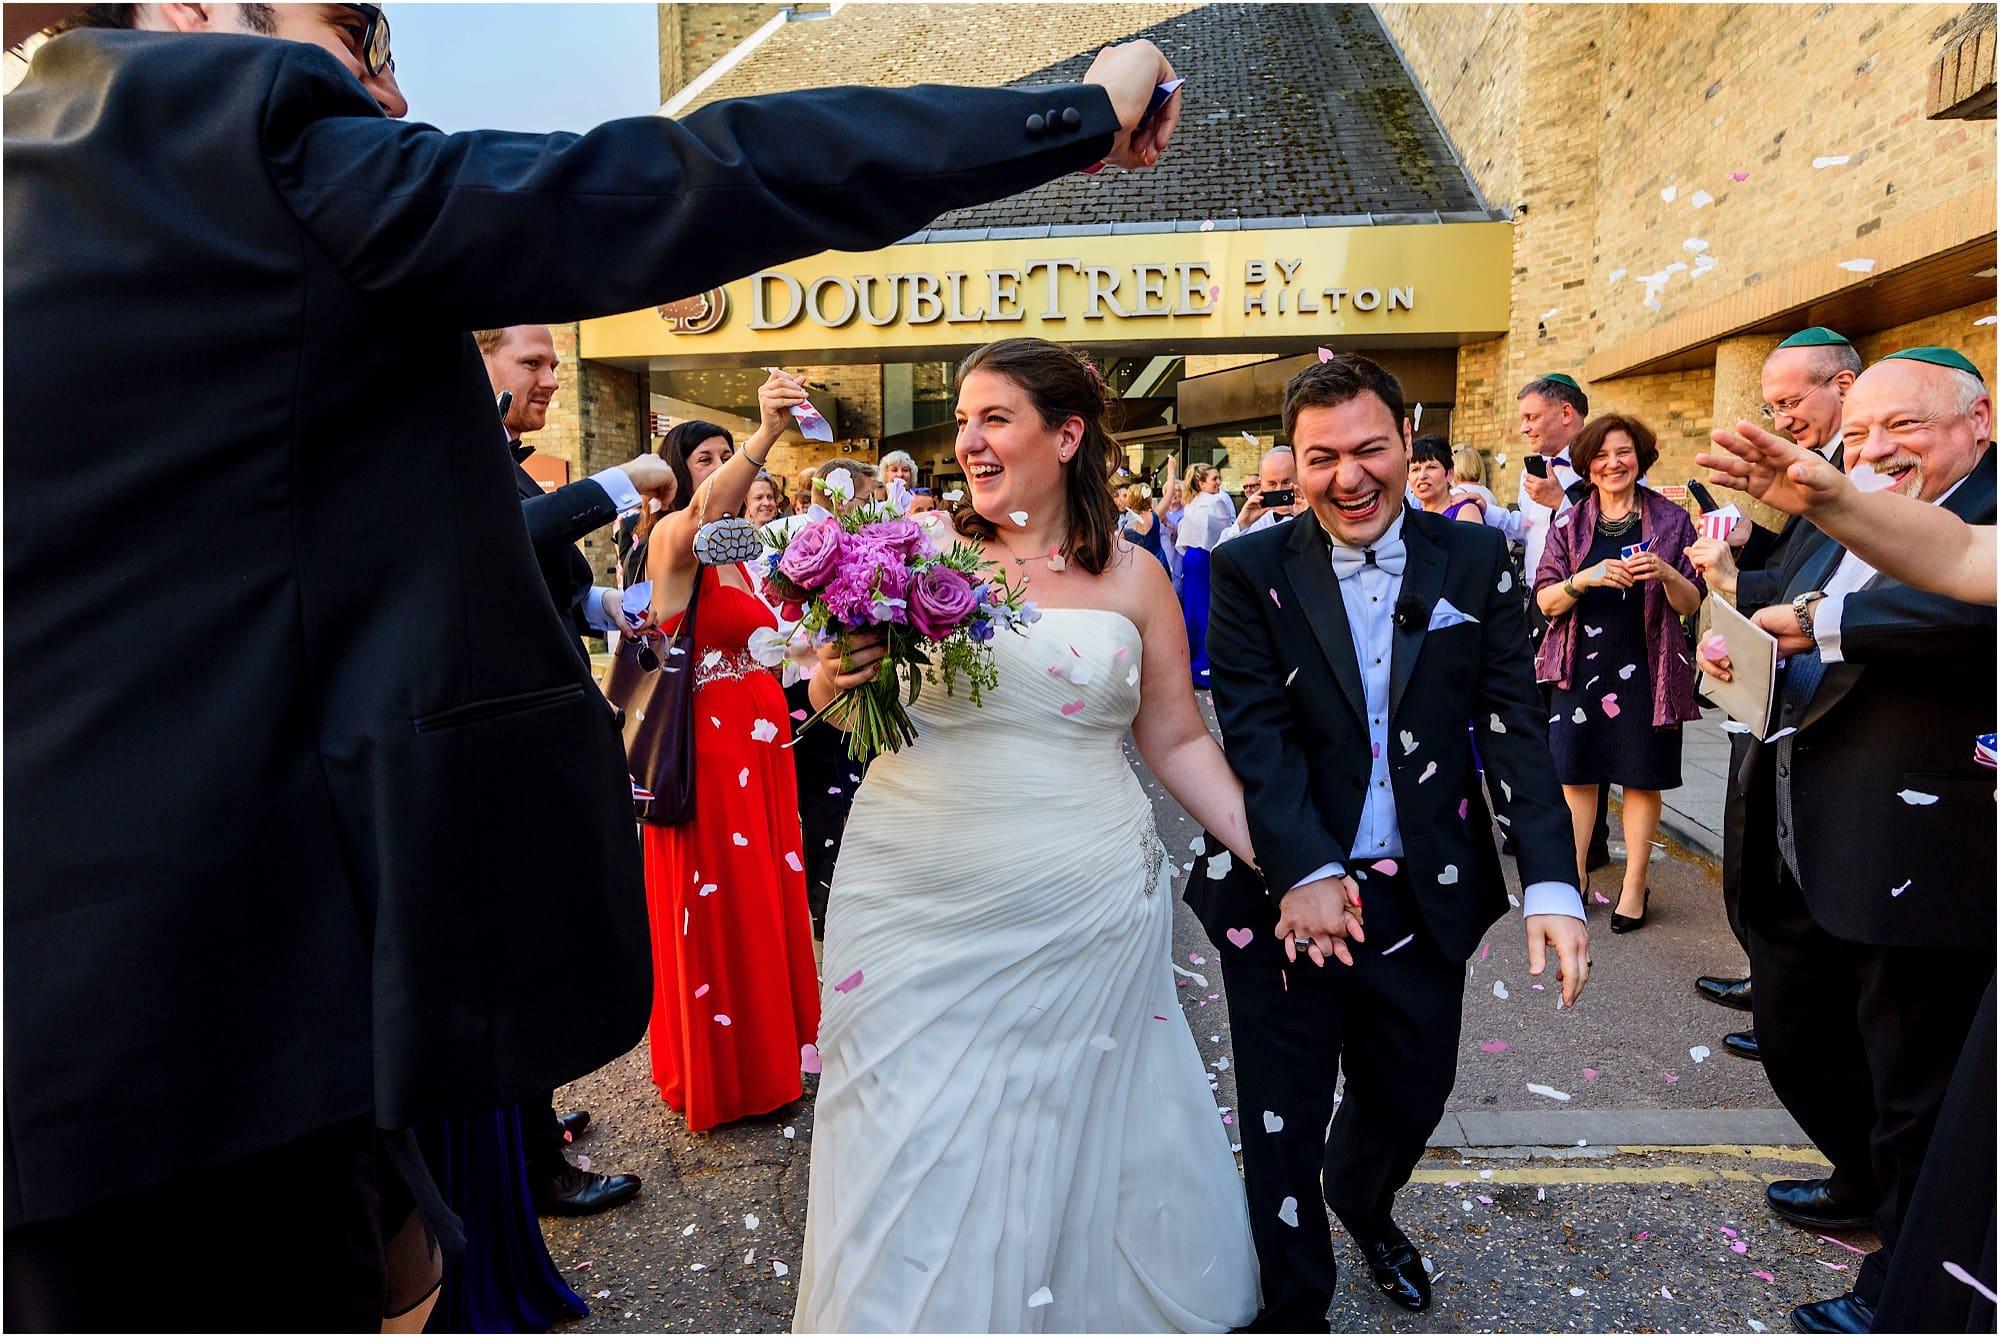 DoubleTree by Hilton Cambridge wedding confetti